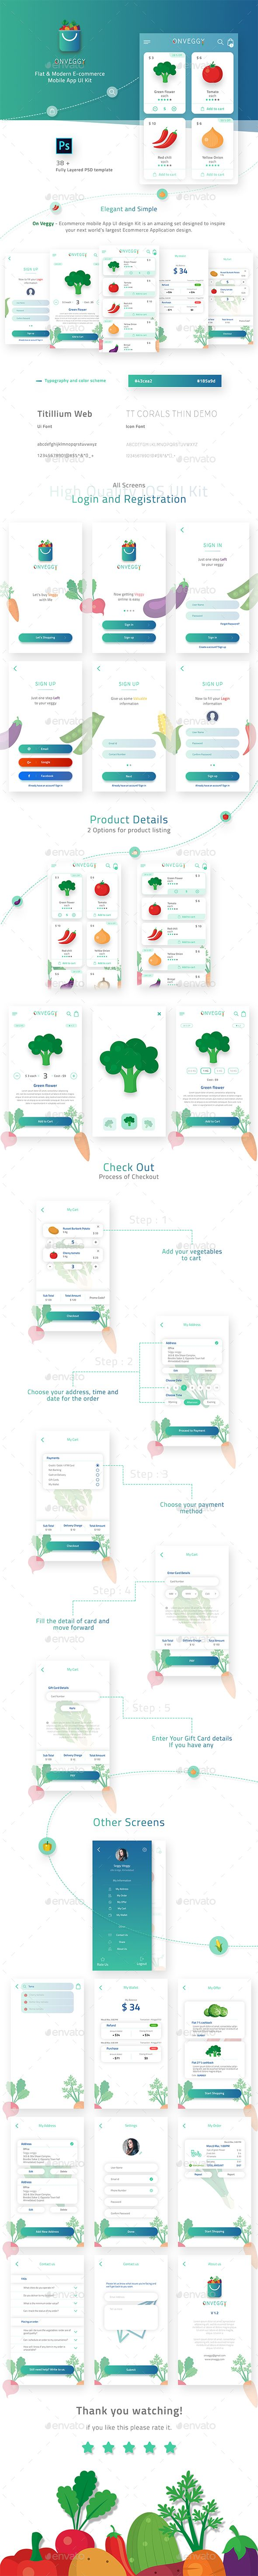 On Veggy  E commerce App UI Kit — Photoshop PSD #store #flat • Download ➝ https://graphicriver.net/item/on-veggy-e-commerce-app-ui-kit/19849220?ref=pxcr